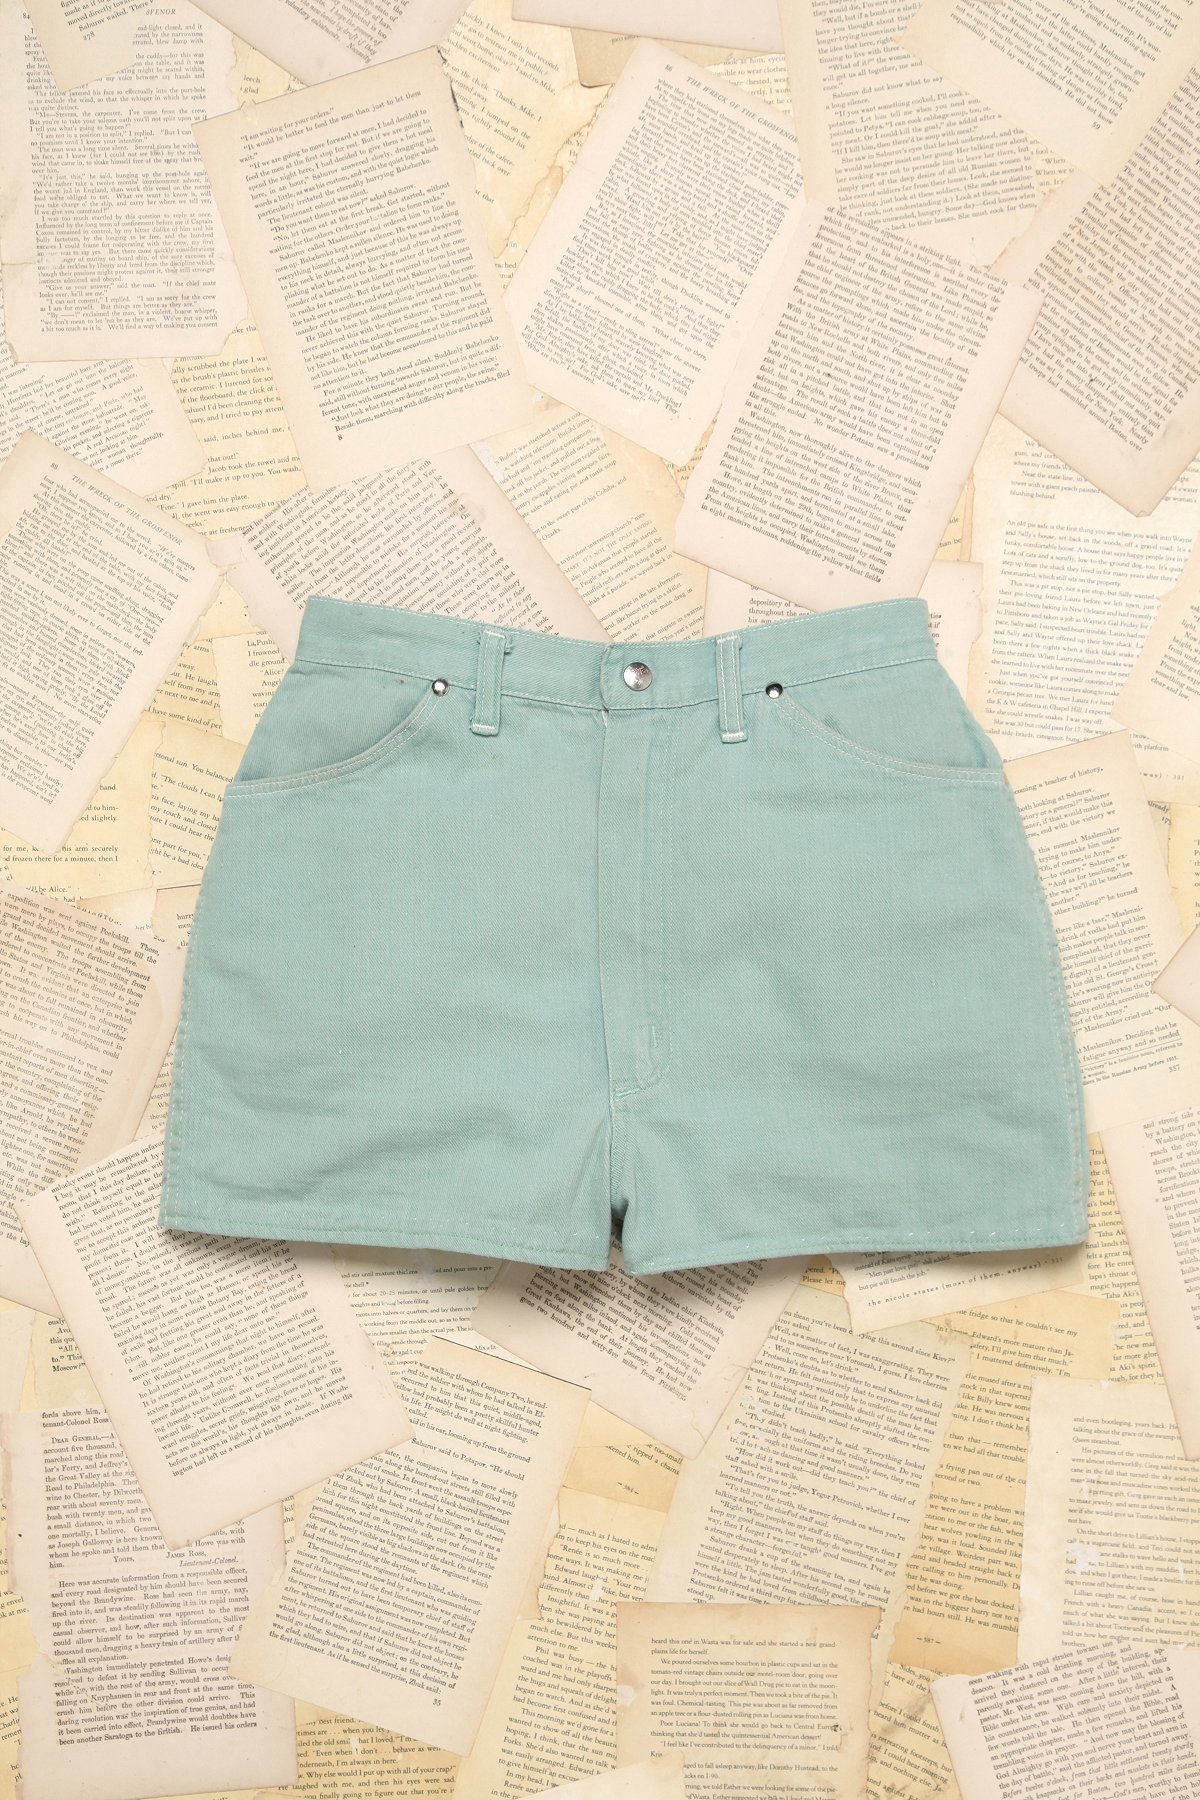 Vintage 1960s Wrangler Shorts